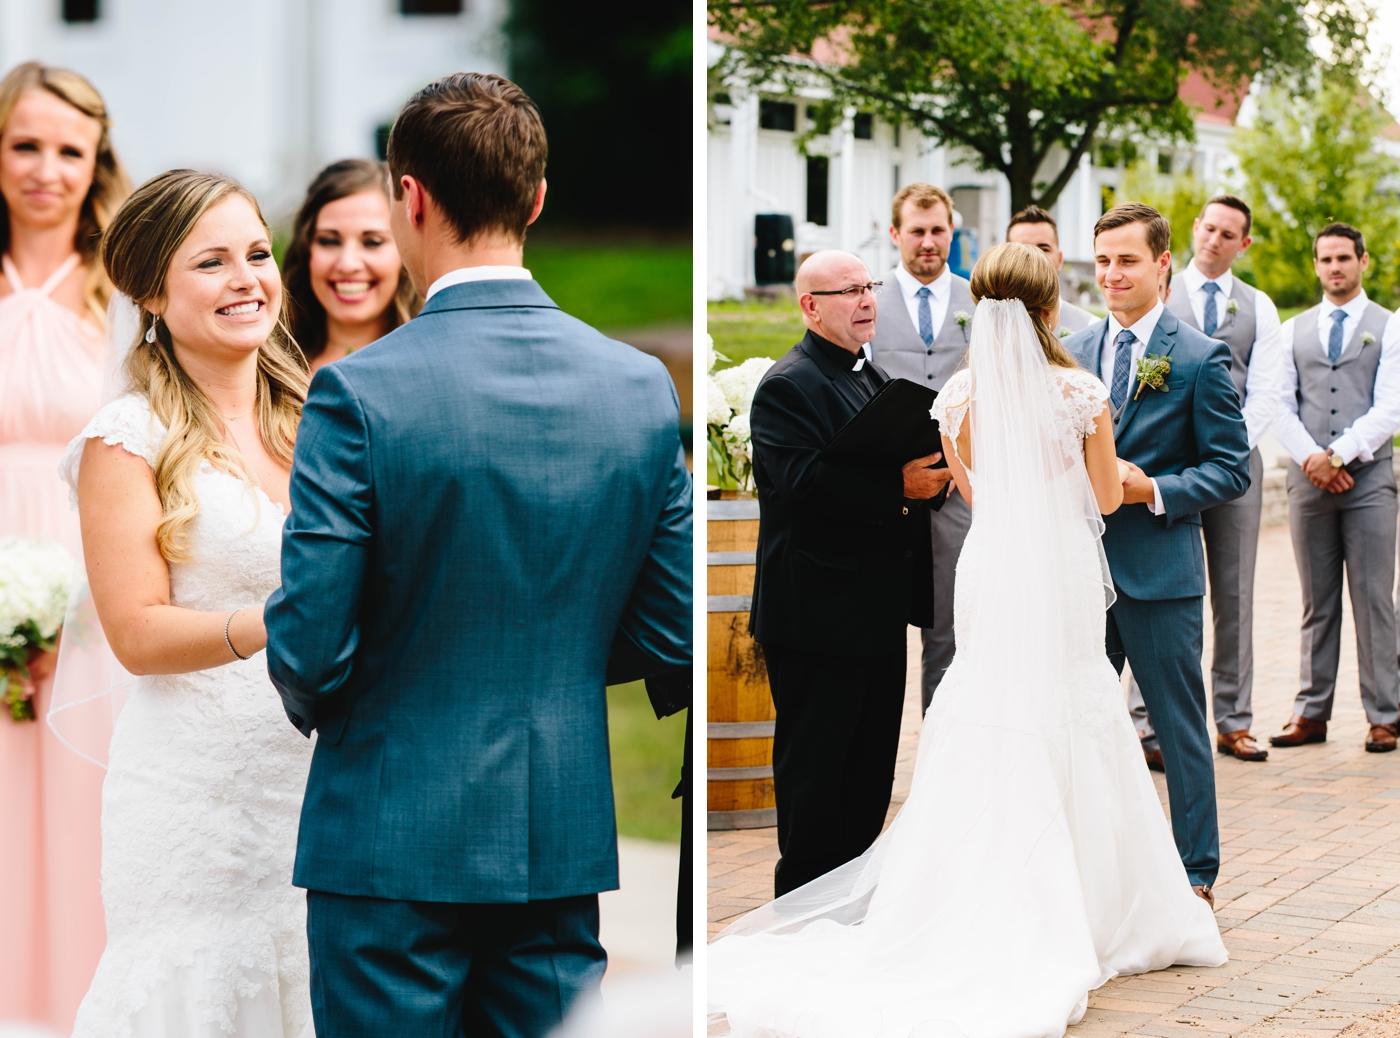 chicago-fine-art-wedding-photography-chiapetta27